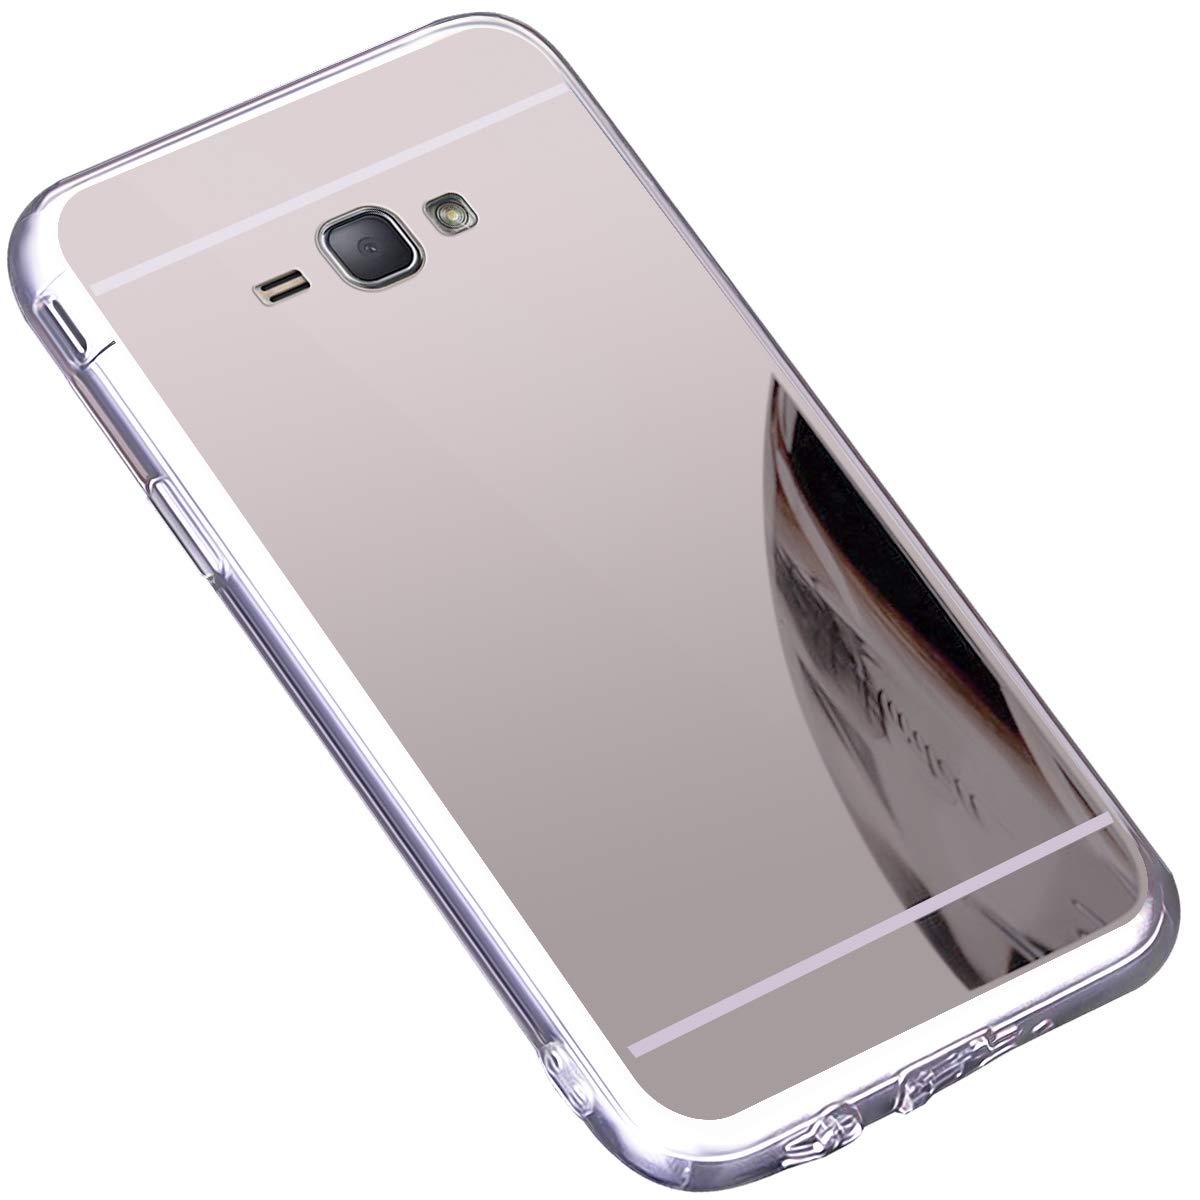 Galaxy J1 2016 Hü lle,Surakey Schutzhü lle fü r Samsung Galaxy J1 2016 Silikon Handyhü lle Spiegel Hü lle Bling Strass TPU Handyhü lle Weiche TPU Telefon-Kasten Mirror Case fü r Samsung Galaxy J1 2016, Gold ELE00160MD